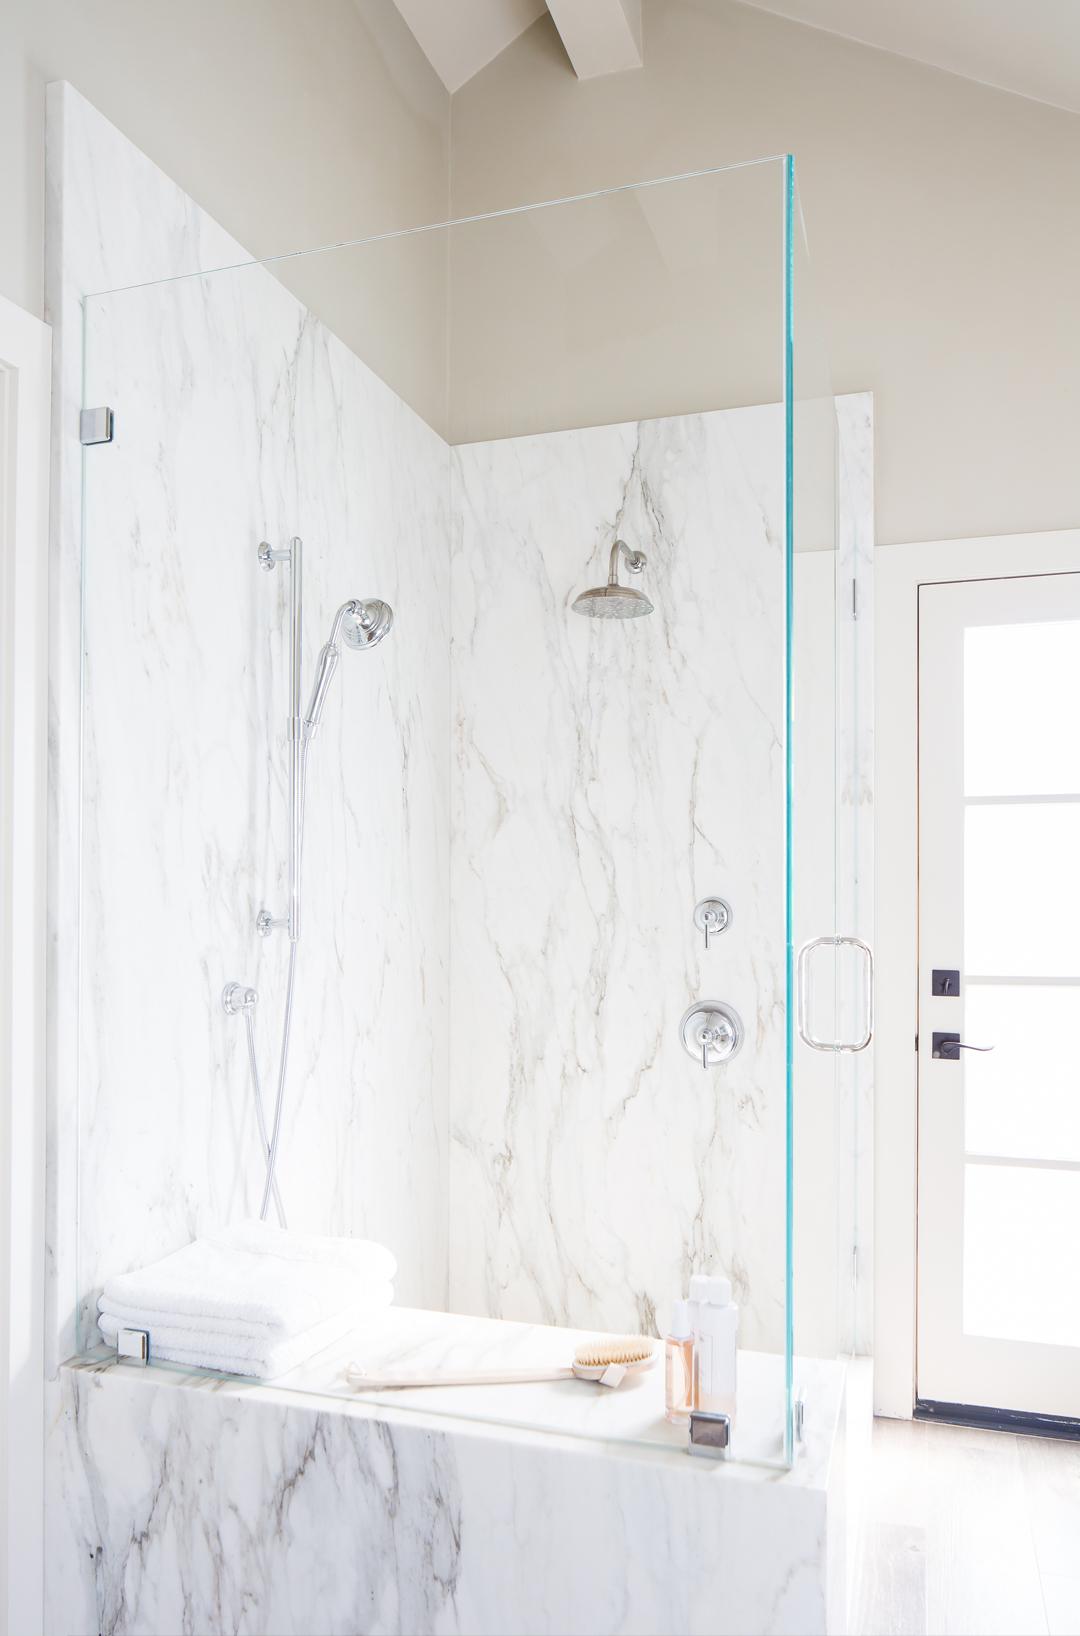 Calacatta Oro honed marble slab